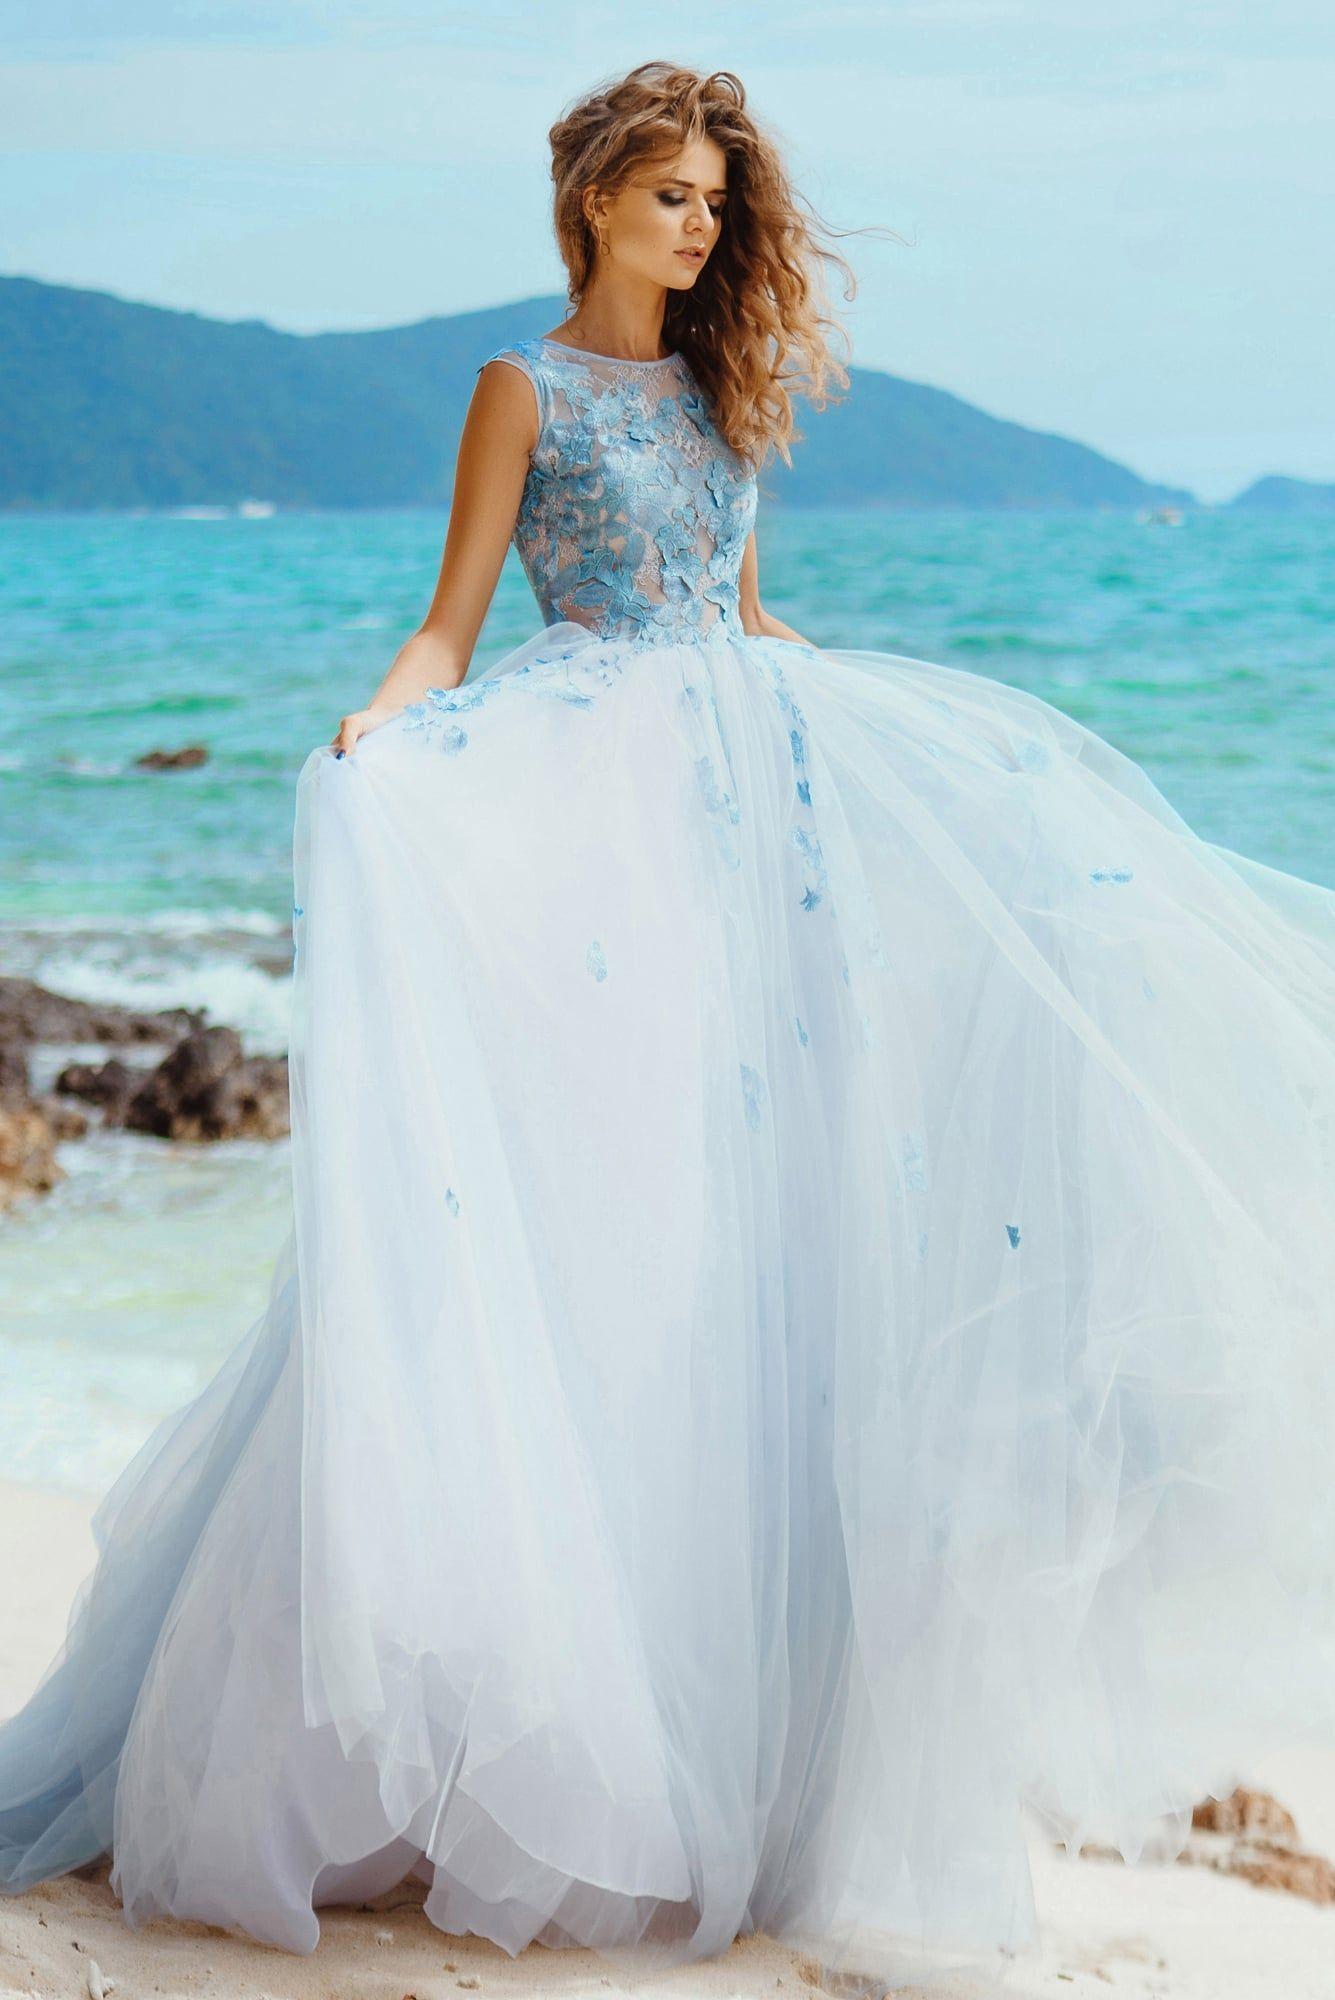 Strekkoza Ciara | Pinterest | Bridal gowns, Wedding dress and Gowns